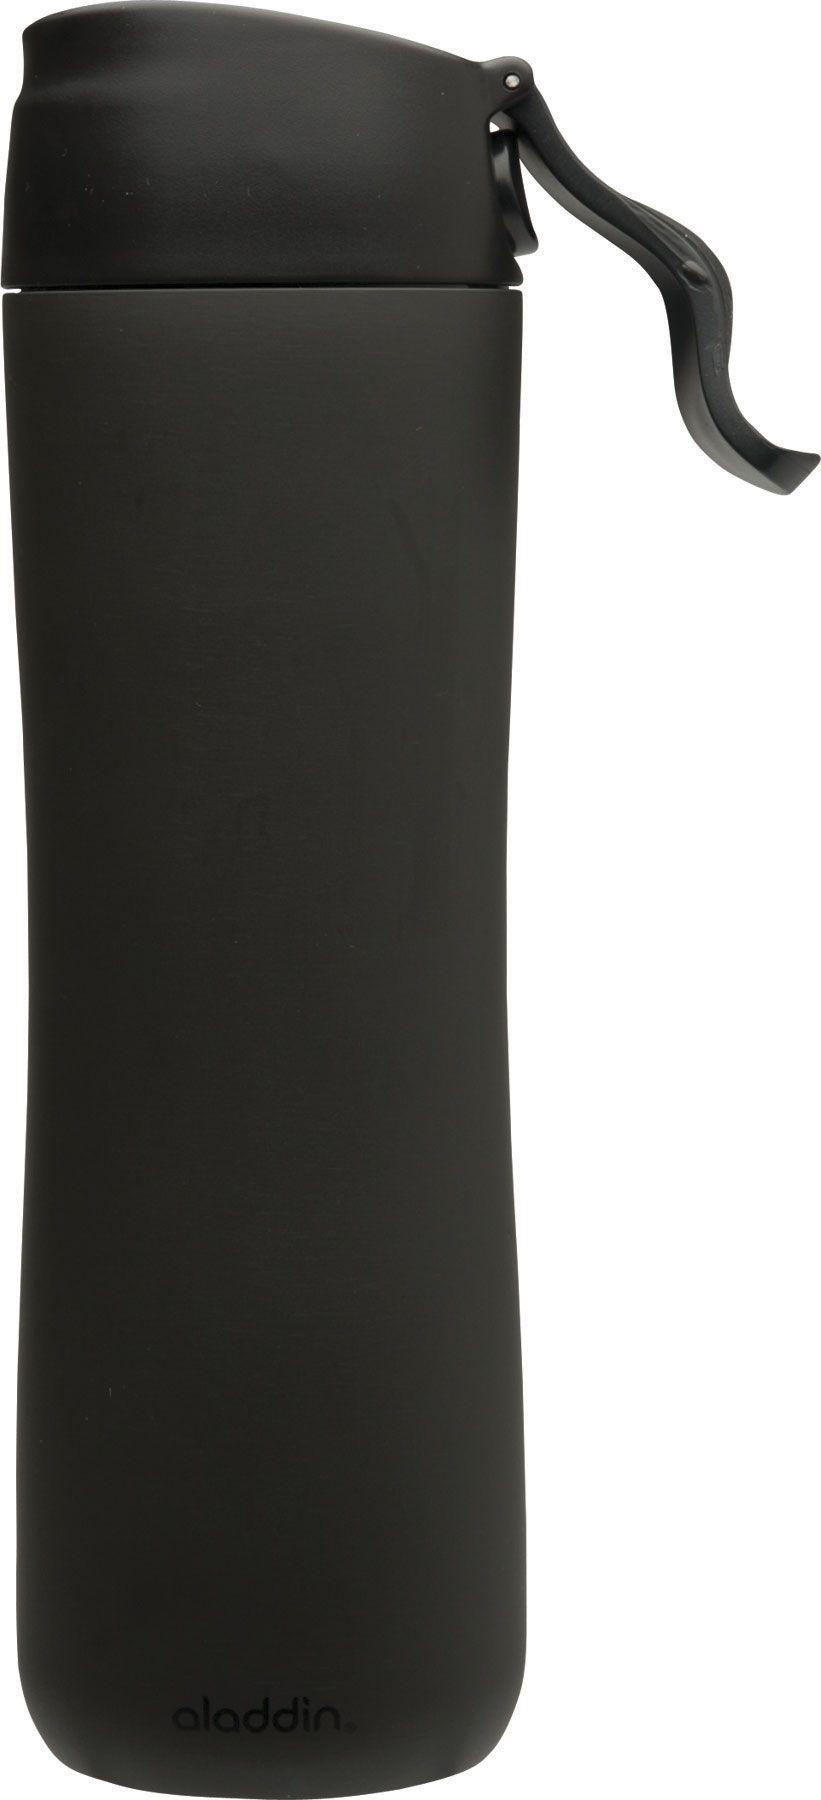 Garrafa Térmica Inox Flip & Sip 473 ml - Aladdin  - Lojão de Ofertas